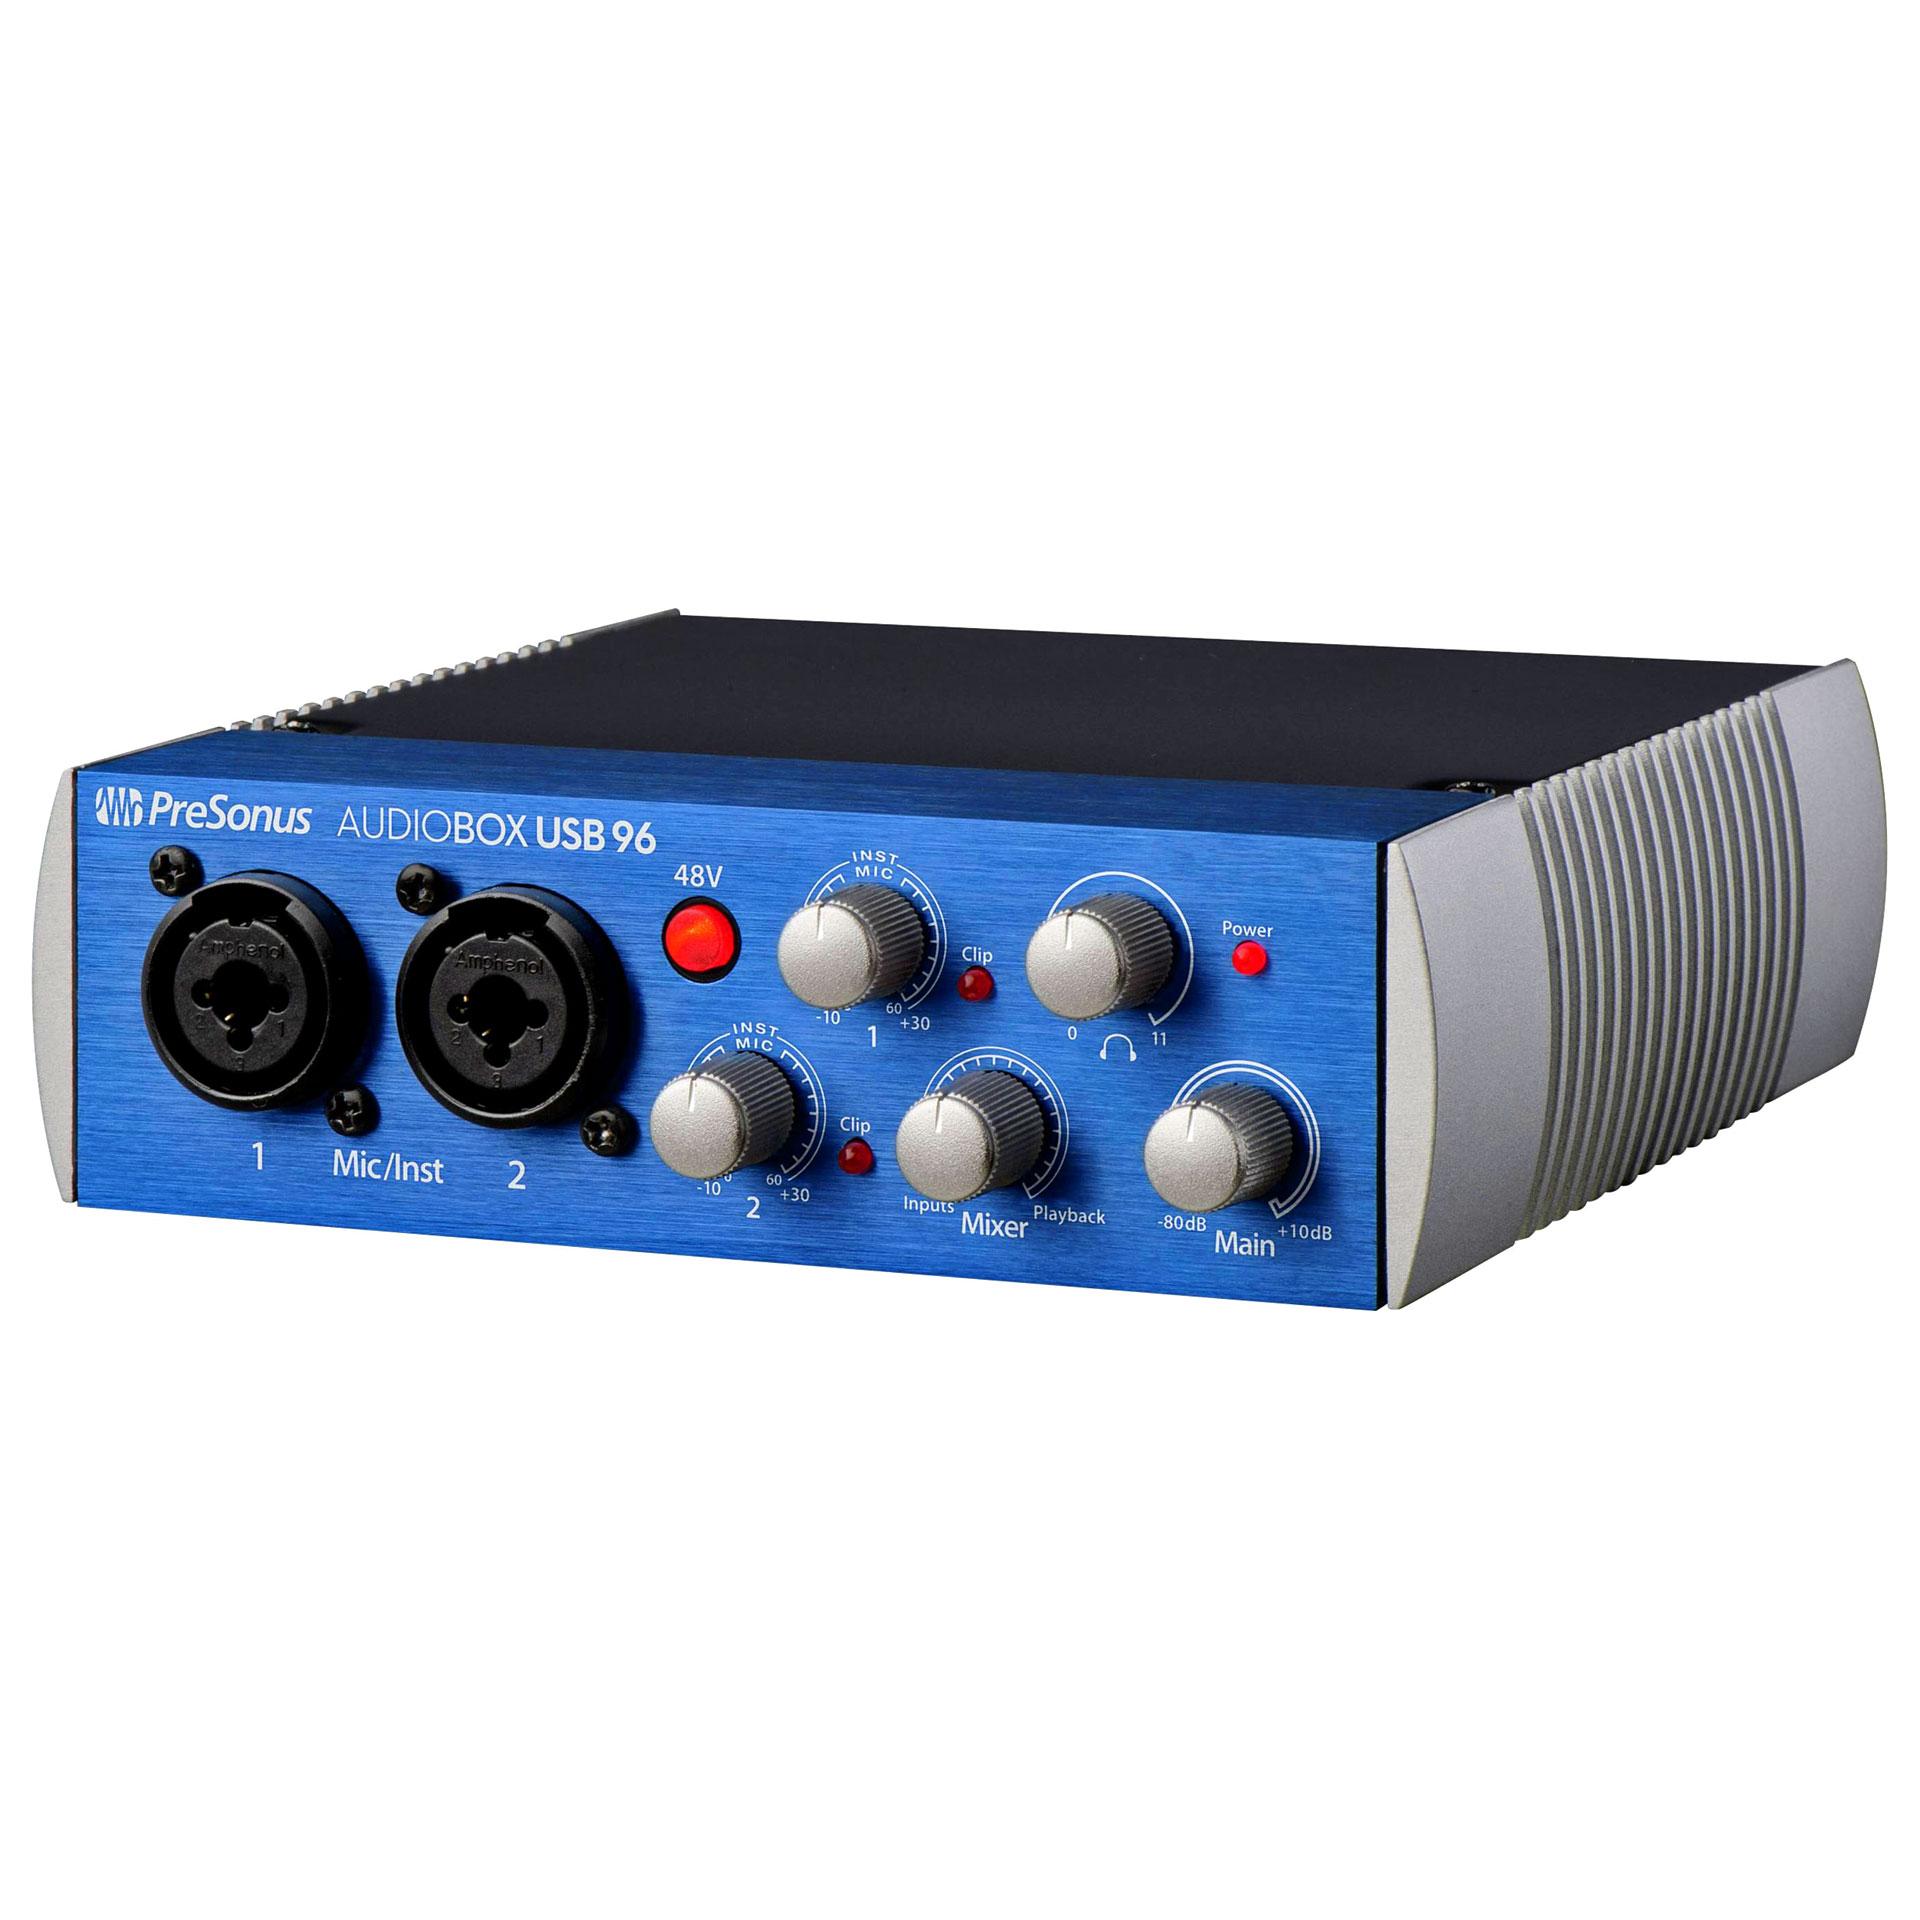 presonus audiobox usb 96 audio interface. Black Bedroom Furniture Sets. Home Design Ideas